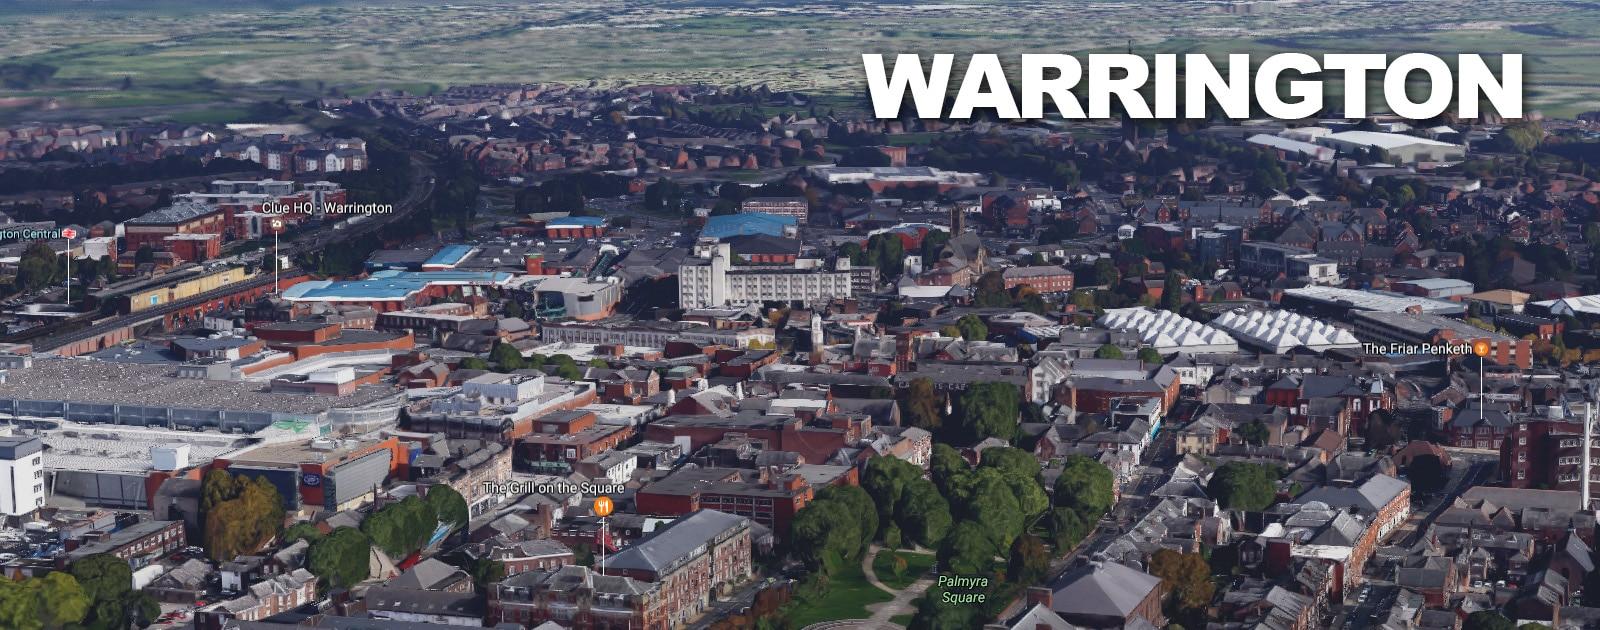 Car Batteries Warrington | Car battery Warrington | Cheap Car Battery Warrington | Car Battery Supplier Warrington